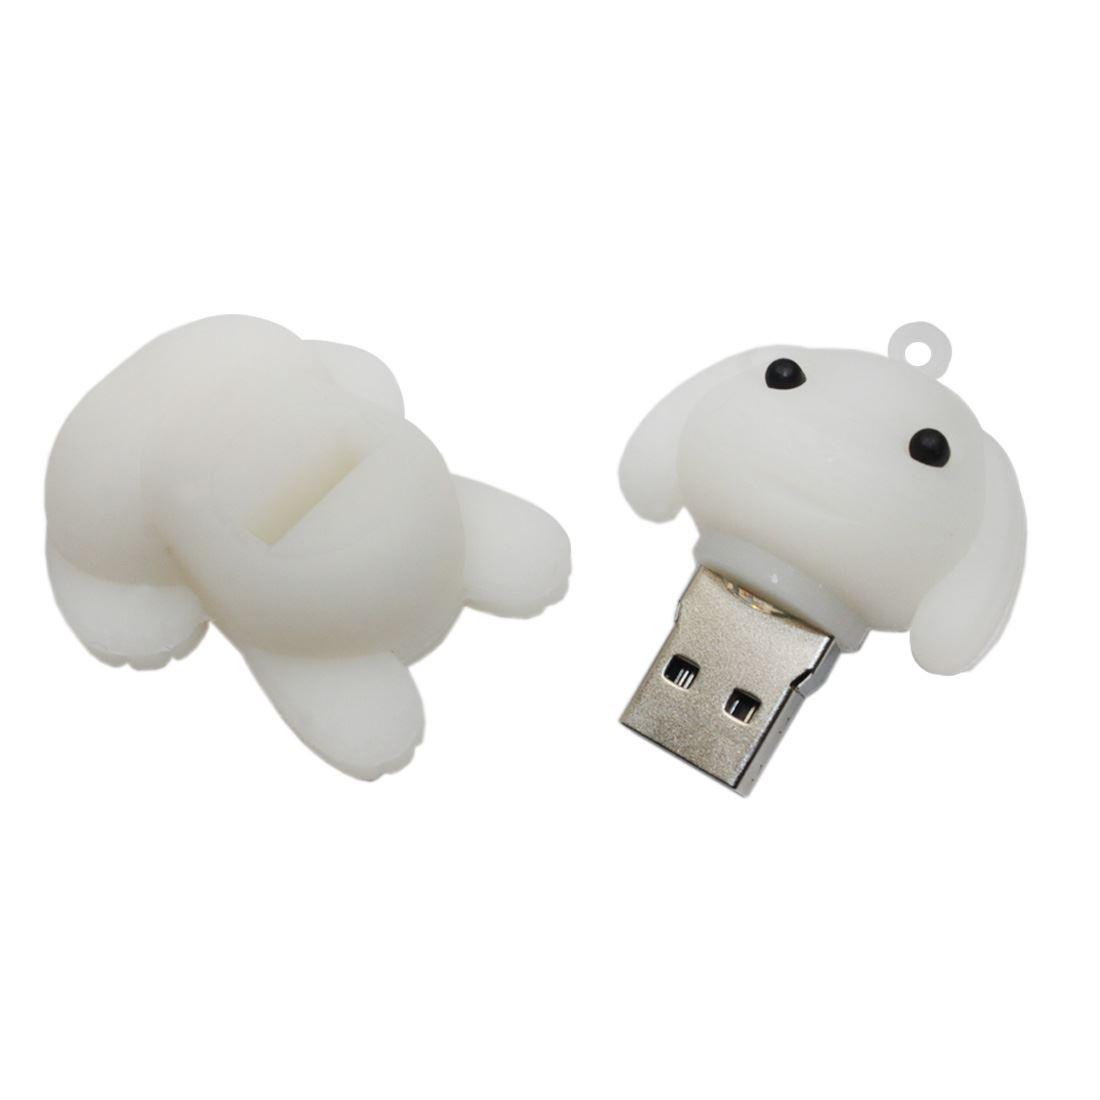 cl usb 2 0 8gb 16gb 32gb chien panda hibou animaux bande dessin e neuf ebay. Black Bedroom Furniture Sets. Home Design Ideas